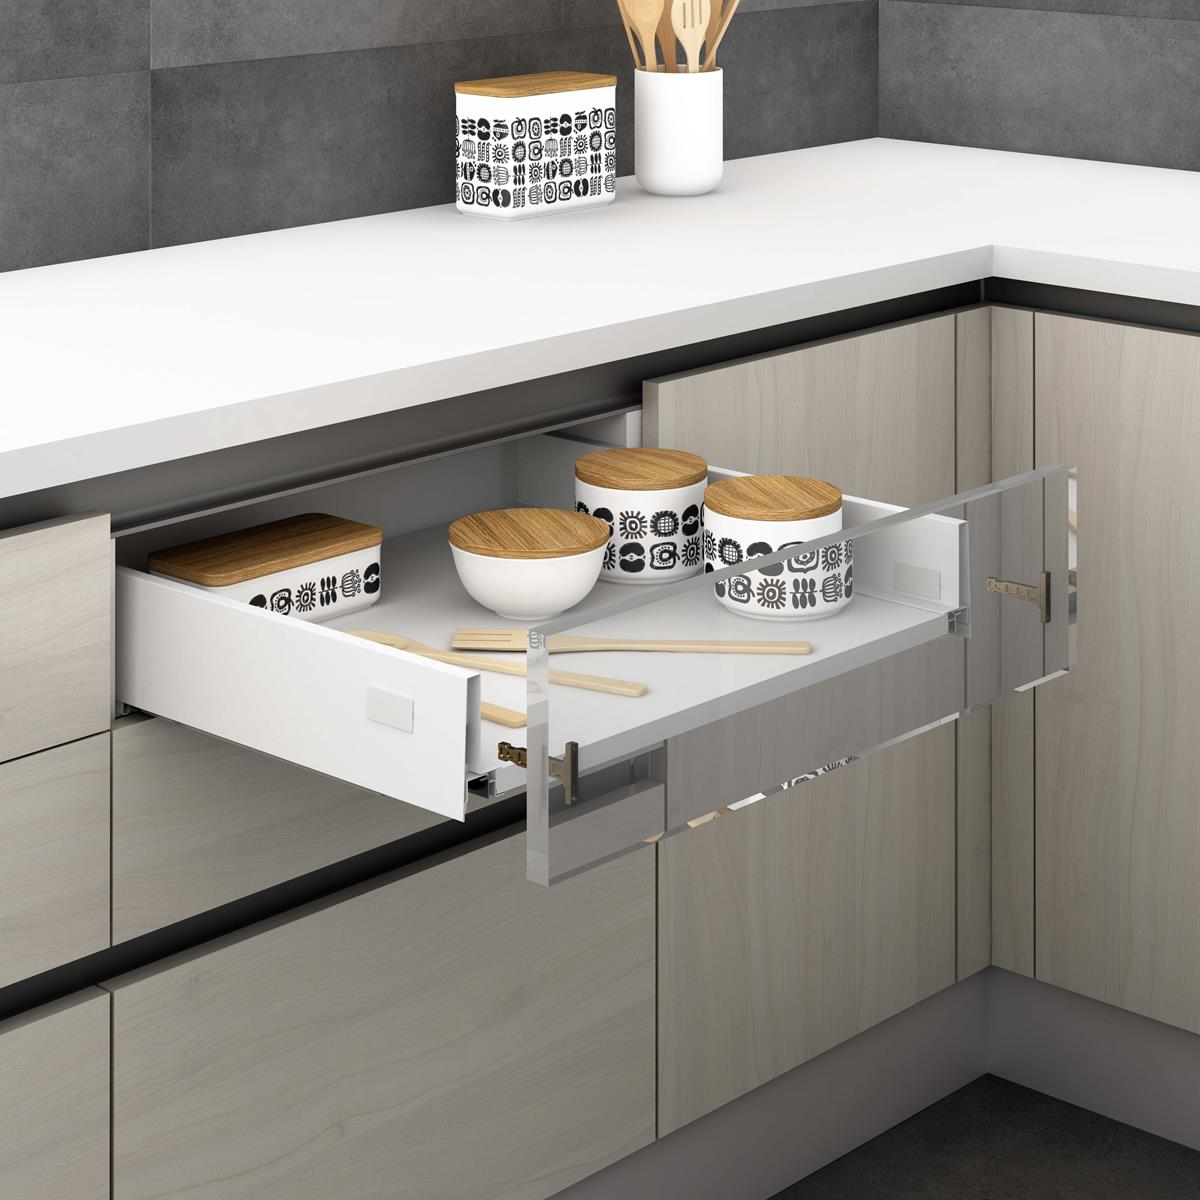 ardis-3d-render-de-muebles-de-cocina